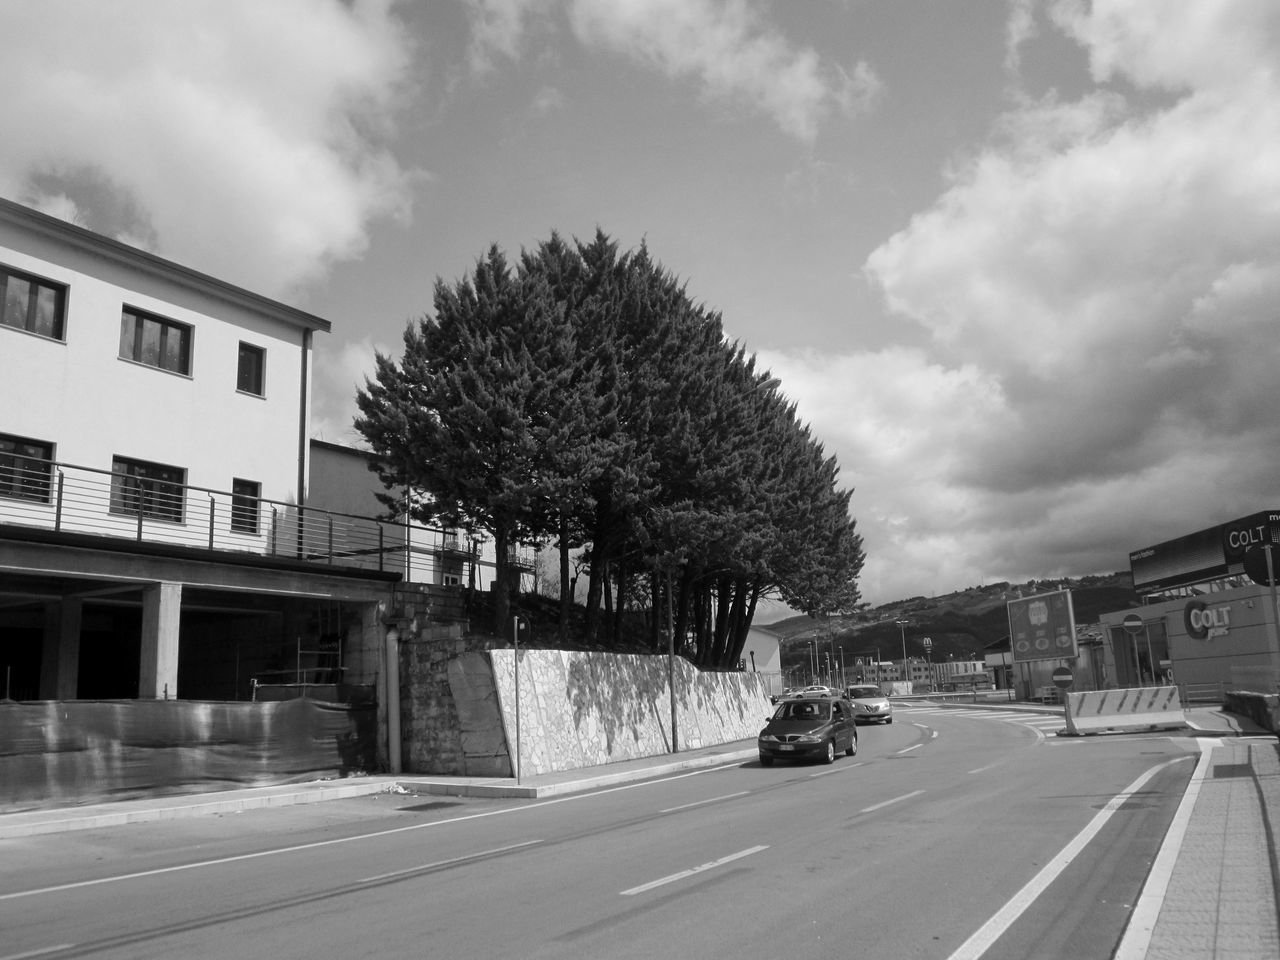 #basilicata #Black&White #blackandwhite #fotobiancoenero #fotobianconero #gallitello #Italia #italy #lucania #OldPicture #potenza #potenzainferiore #urban #urbanphotography